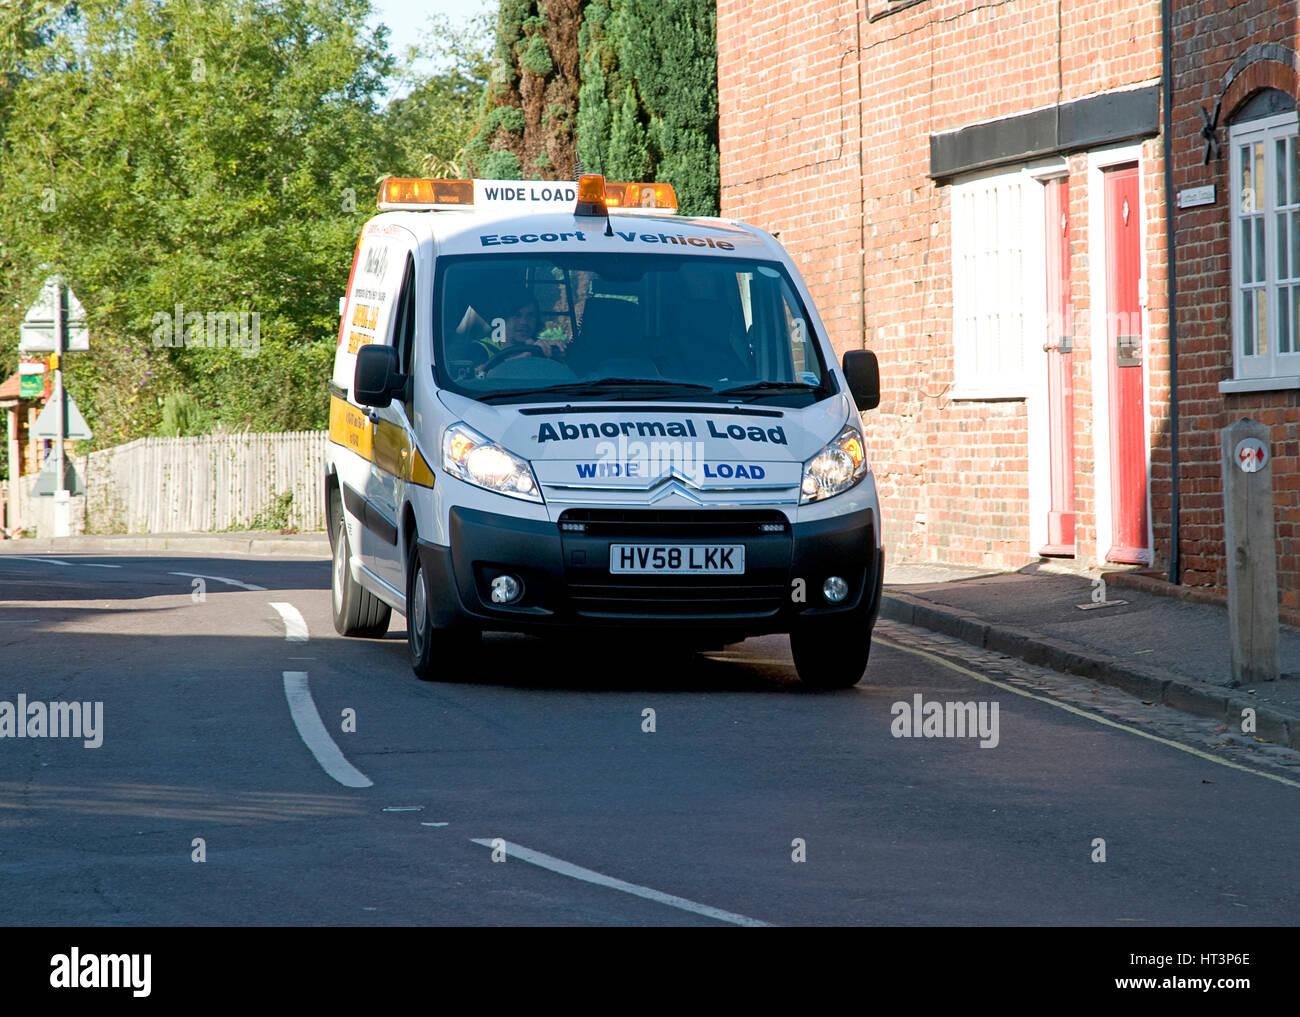 2008 Citroen van abnormal load warning vehicle Artist: Unknown. - Stock Image